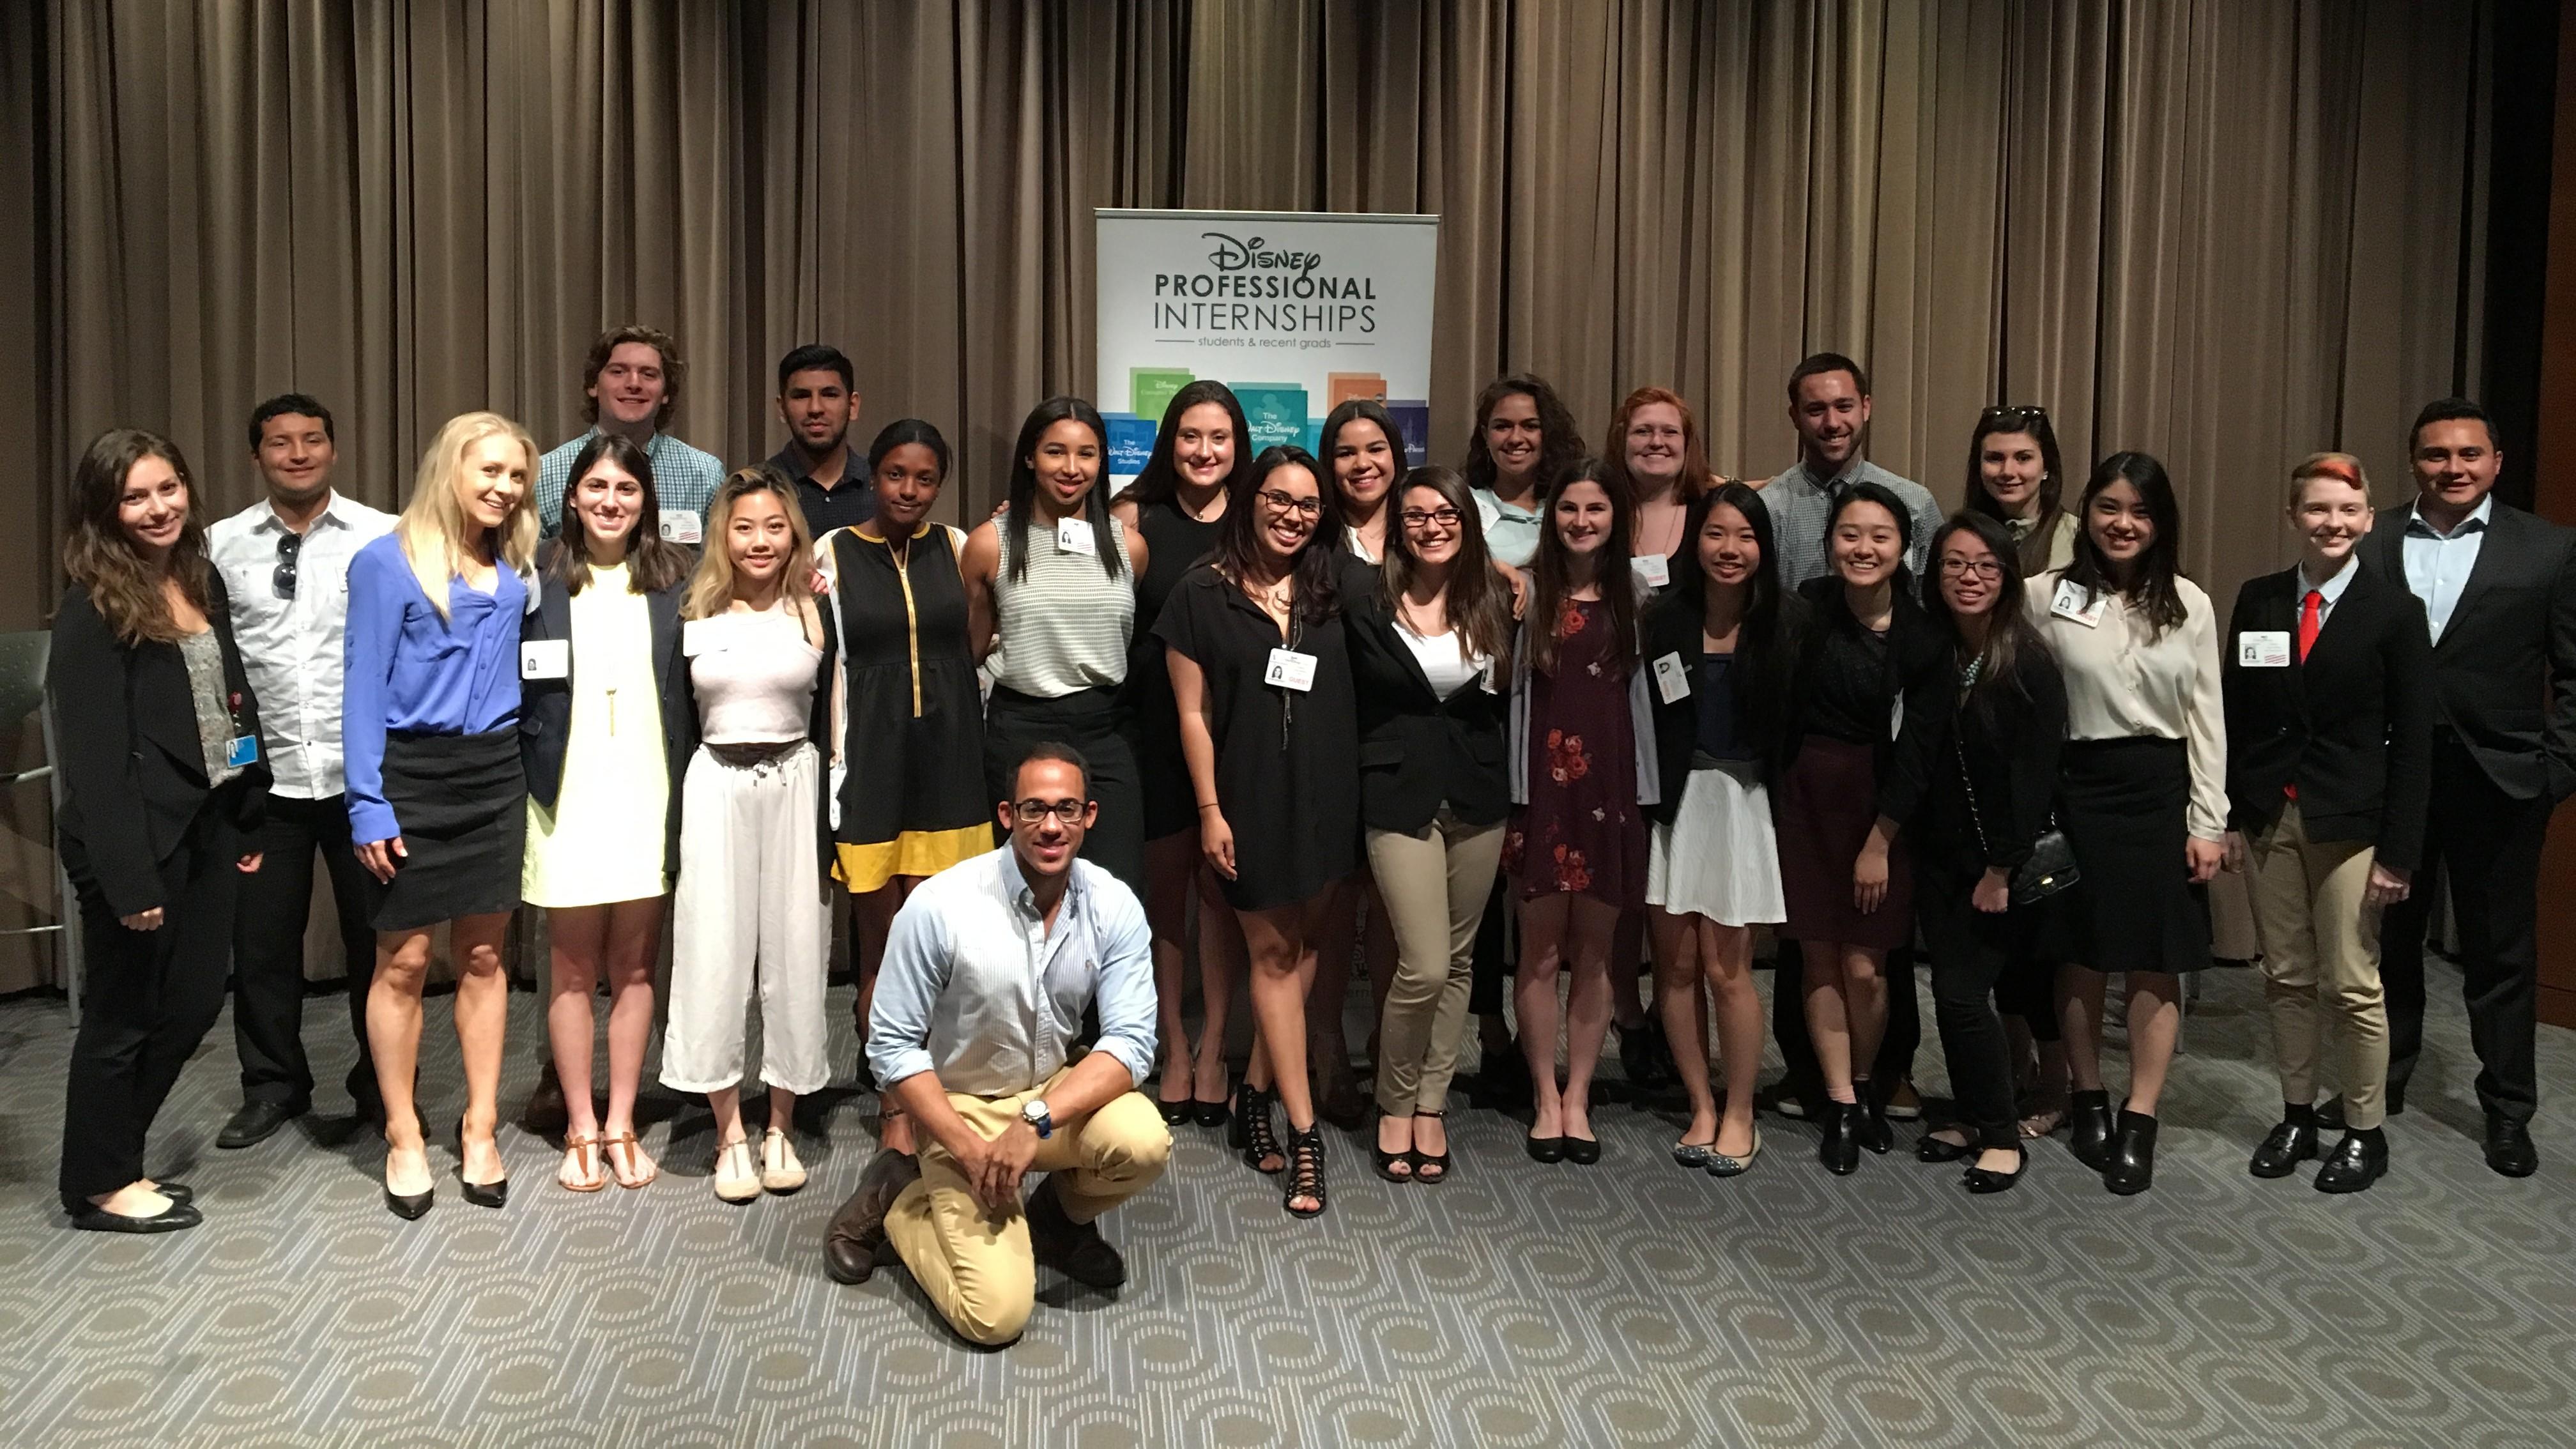 Students at a Disney Professional Internships meeting